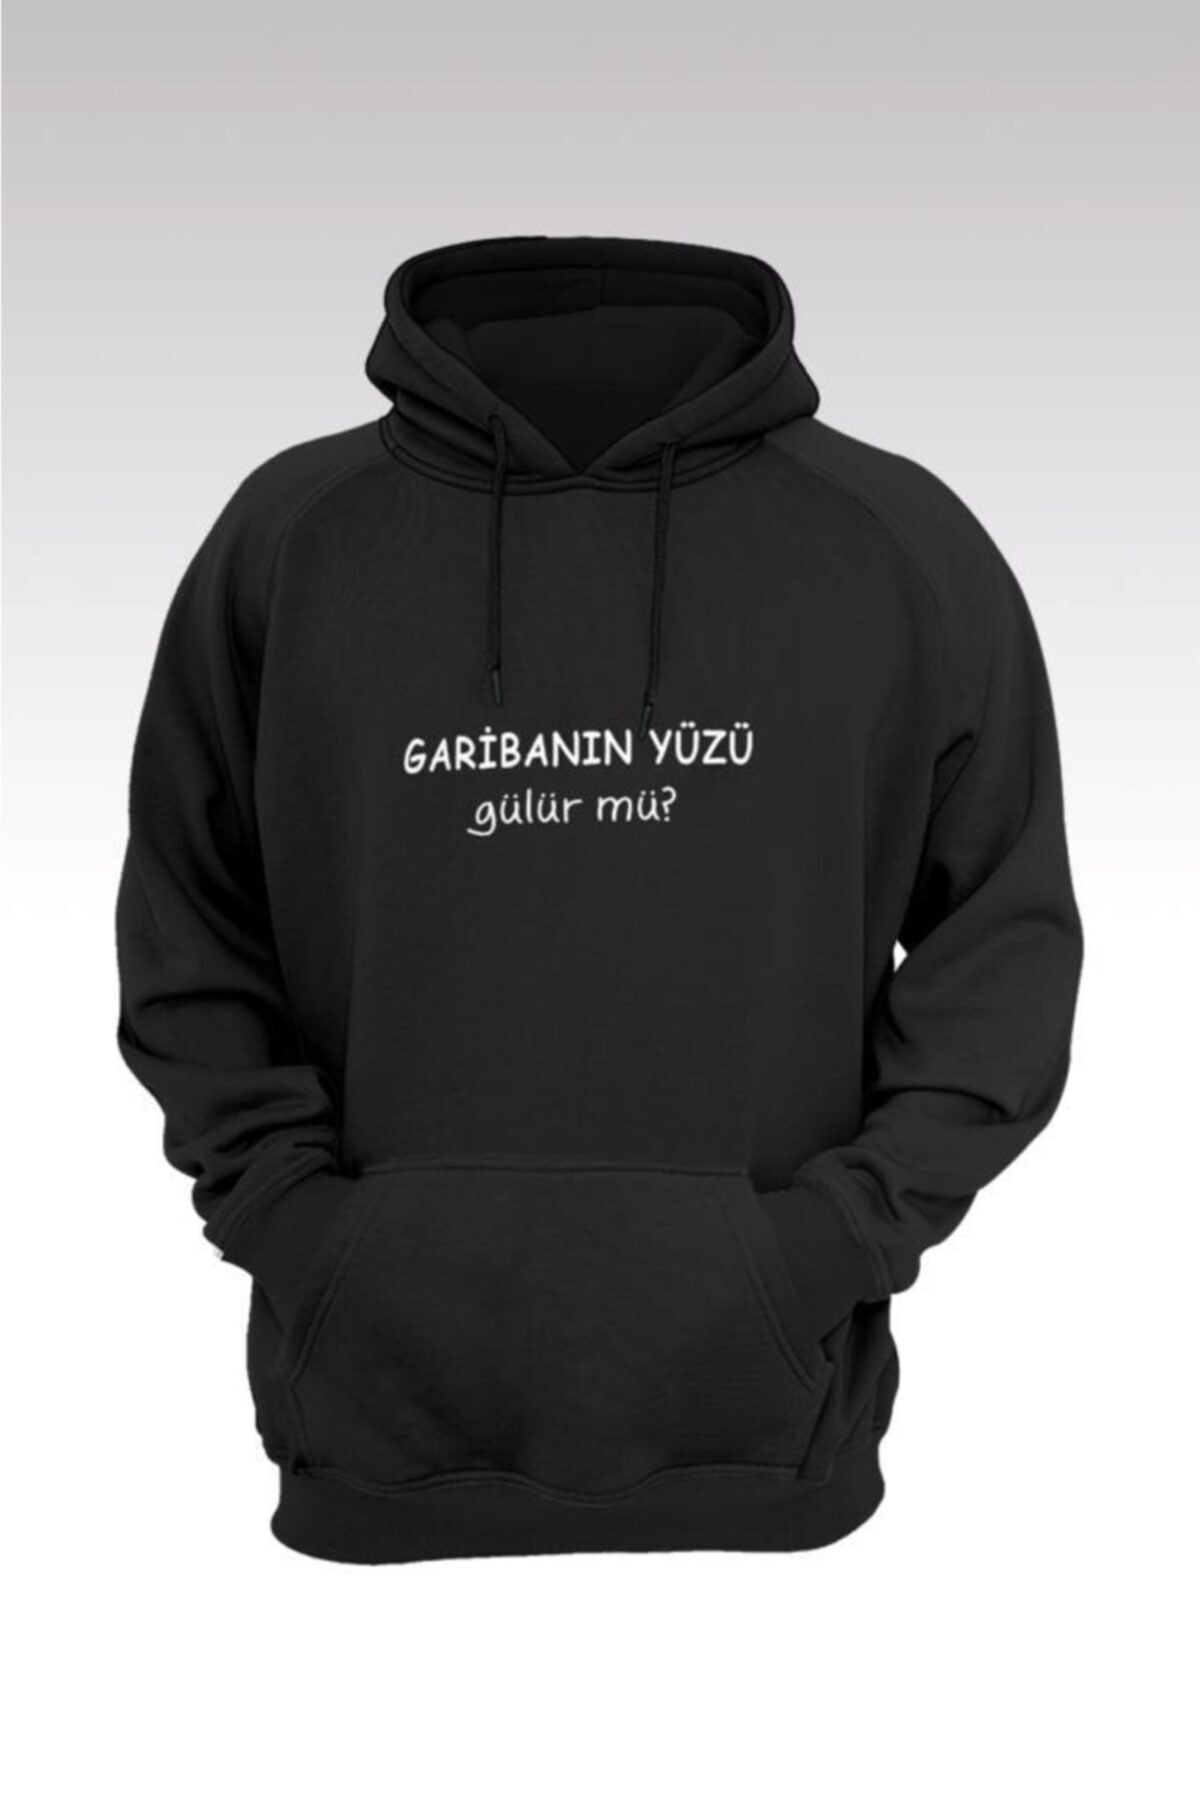 Tonny Mood Unisex Siyah Garibanın Yüzü Gülür Mü 206 Kapüşonlu Sweatshirt - Hoodie 1